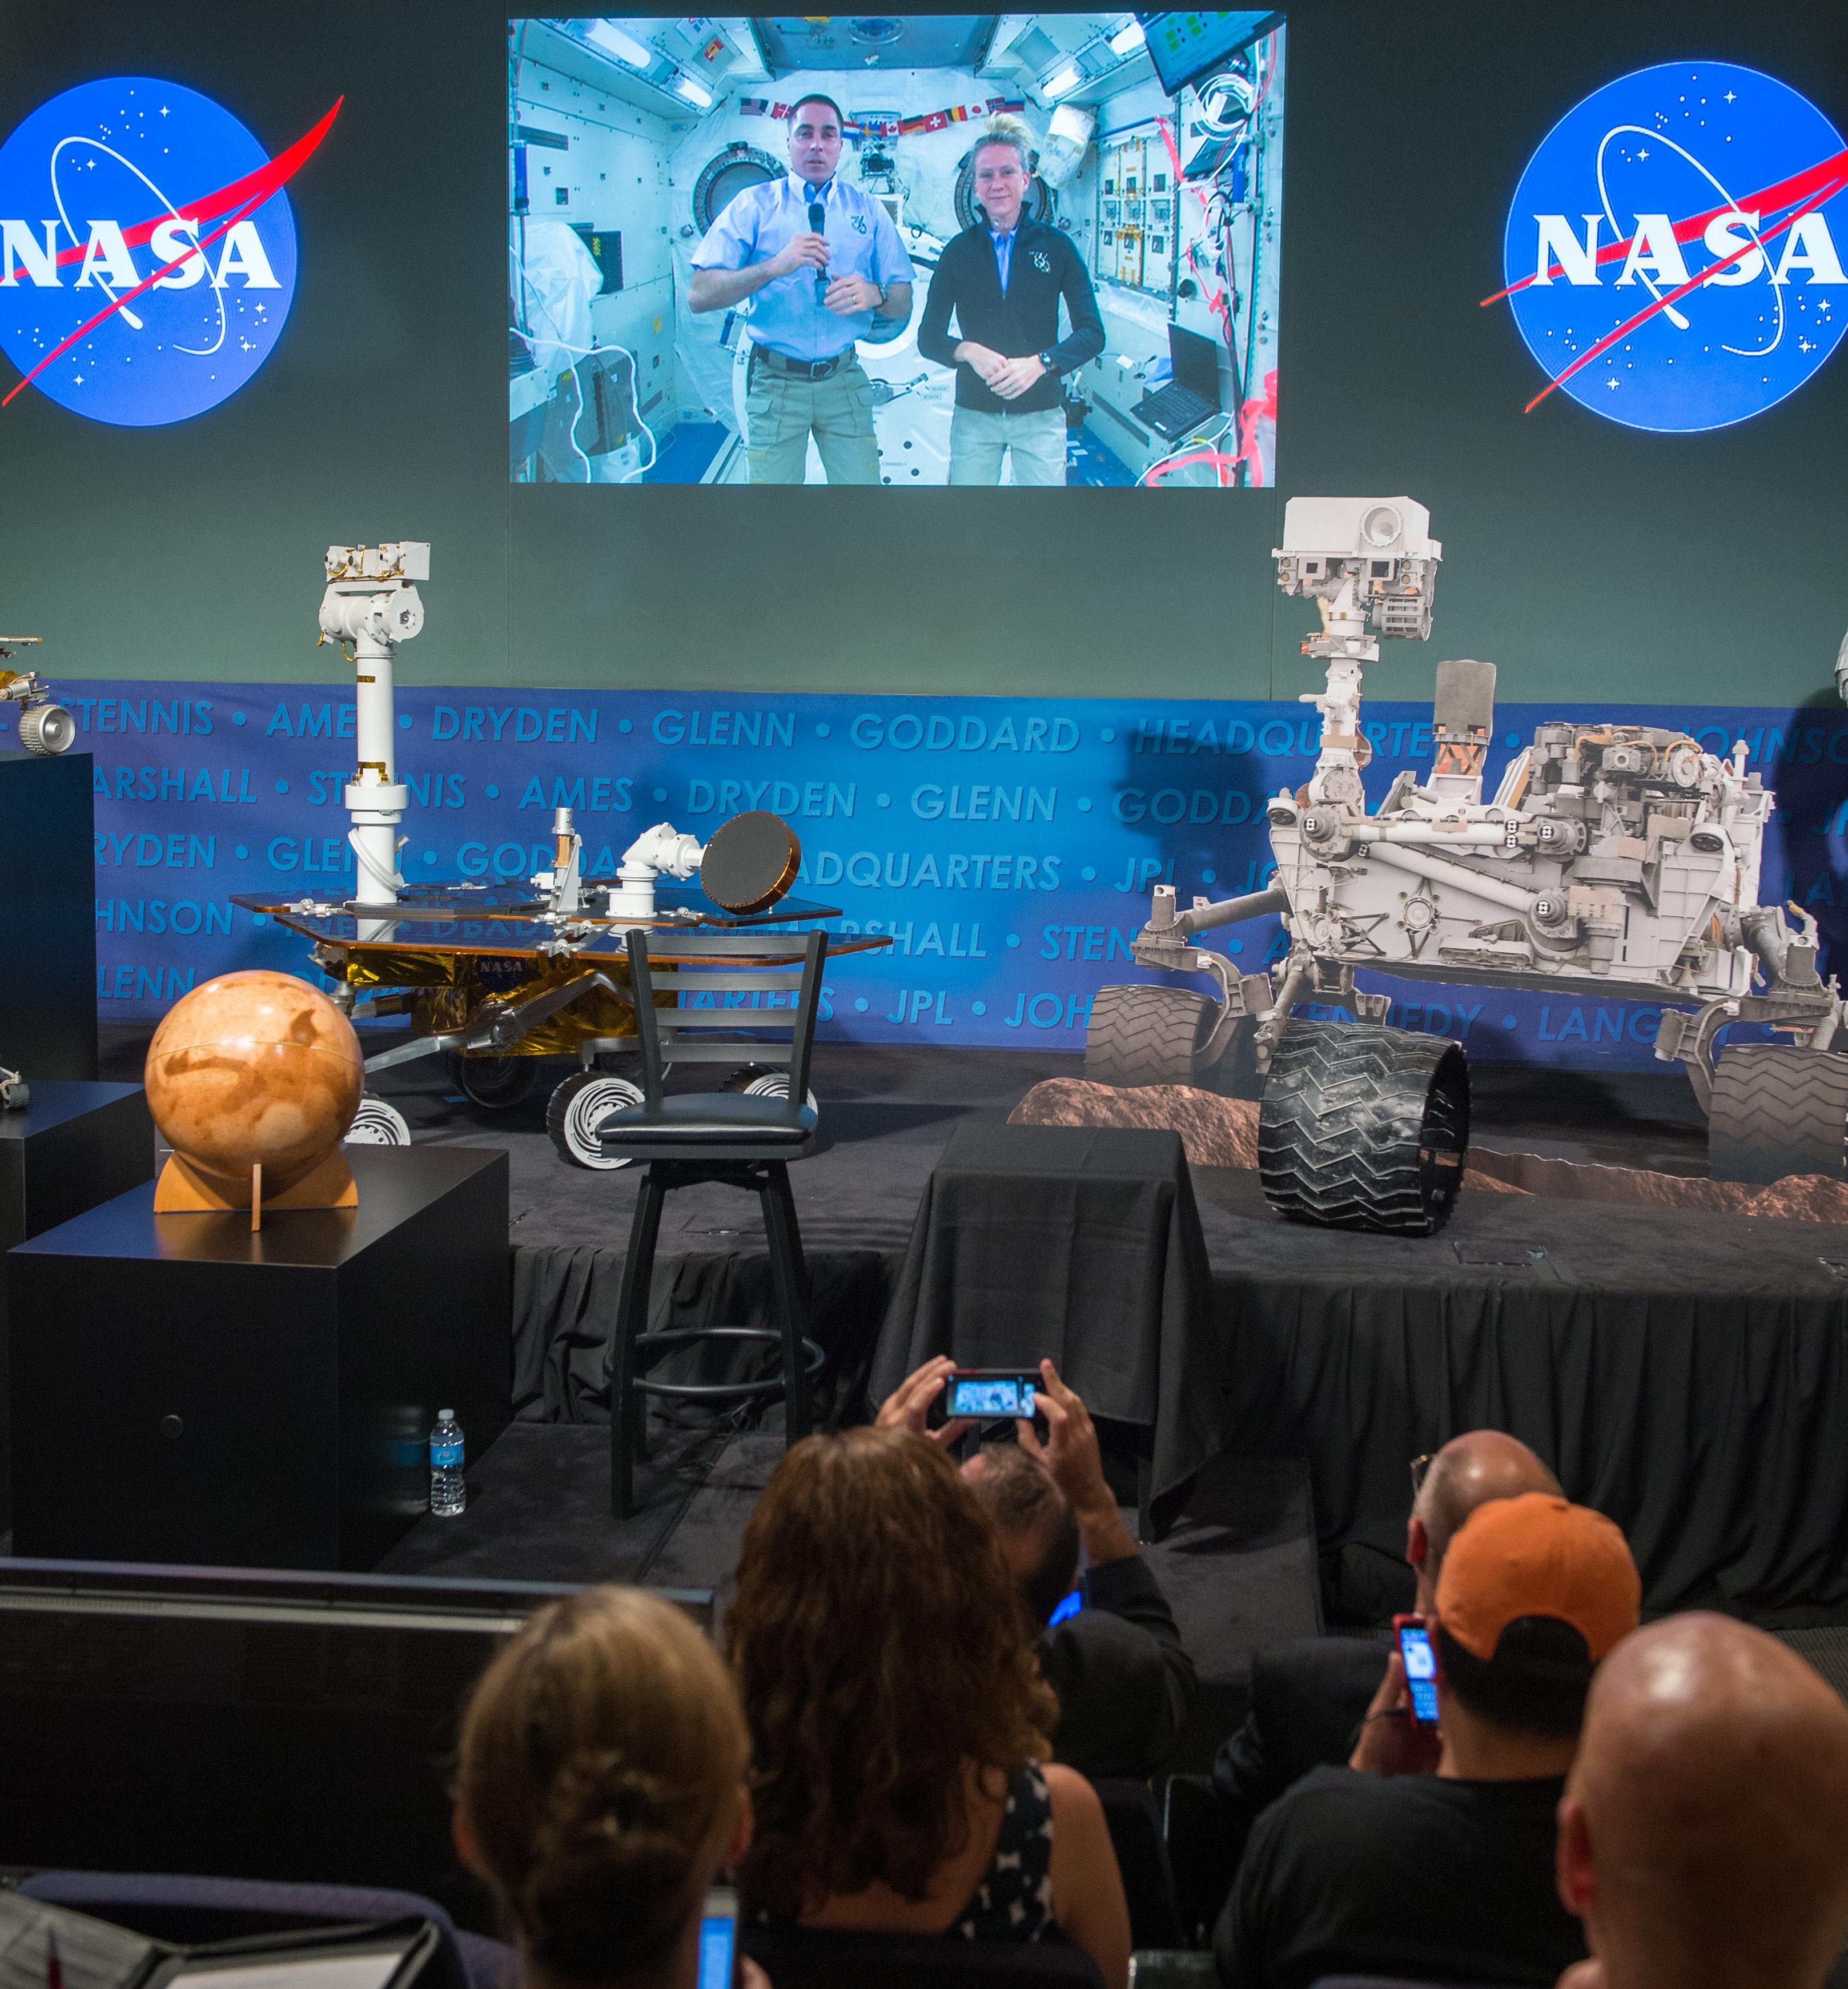 mars curiosity rover live feed - photo #43